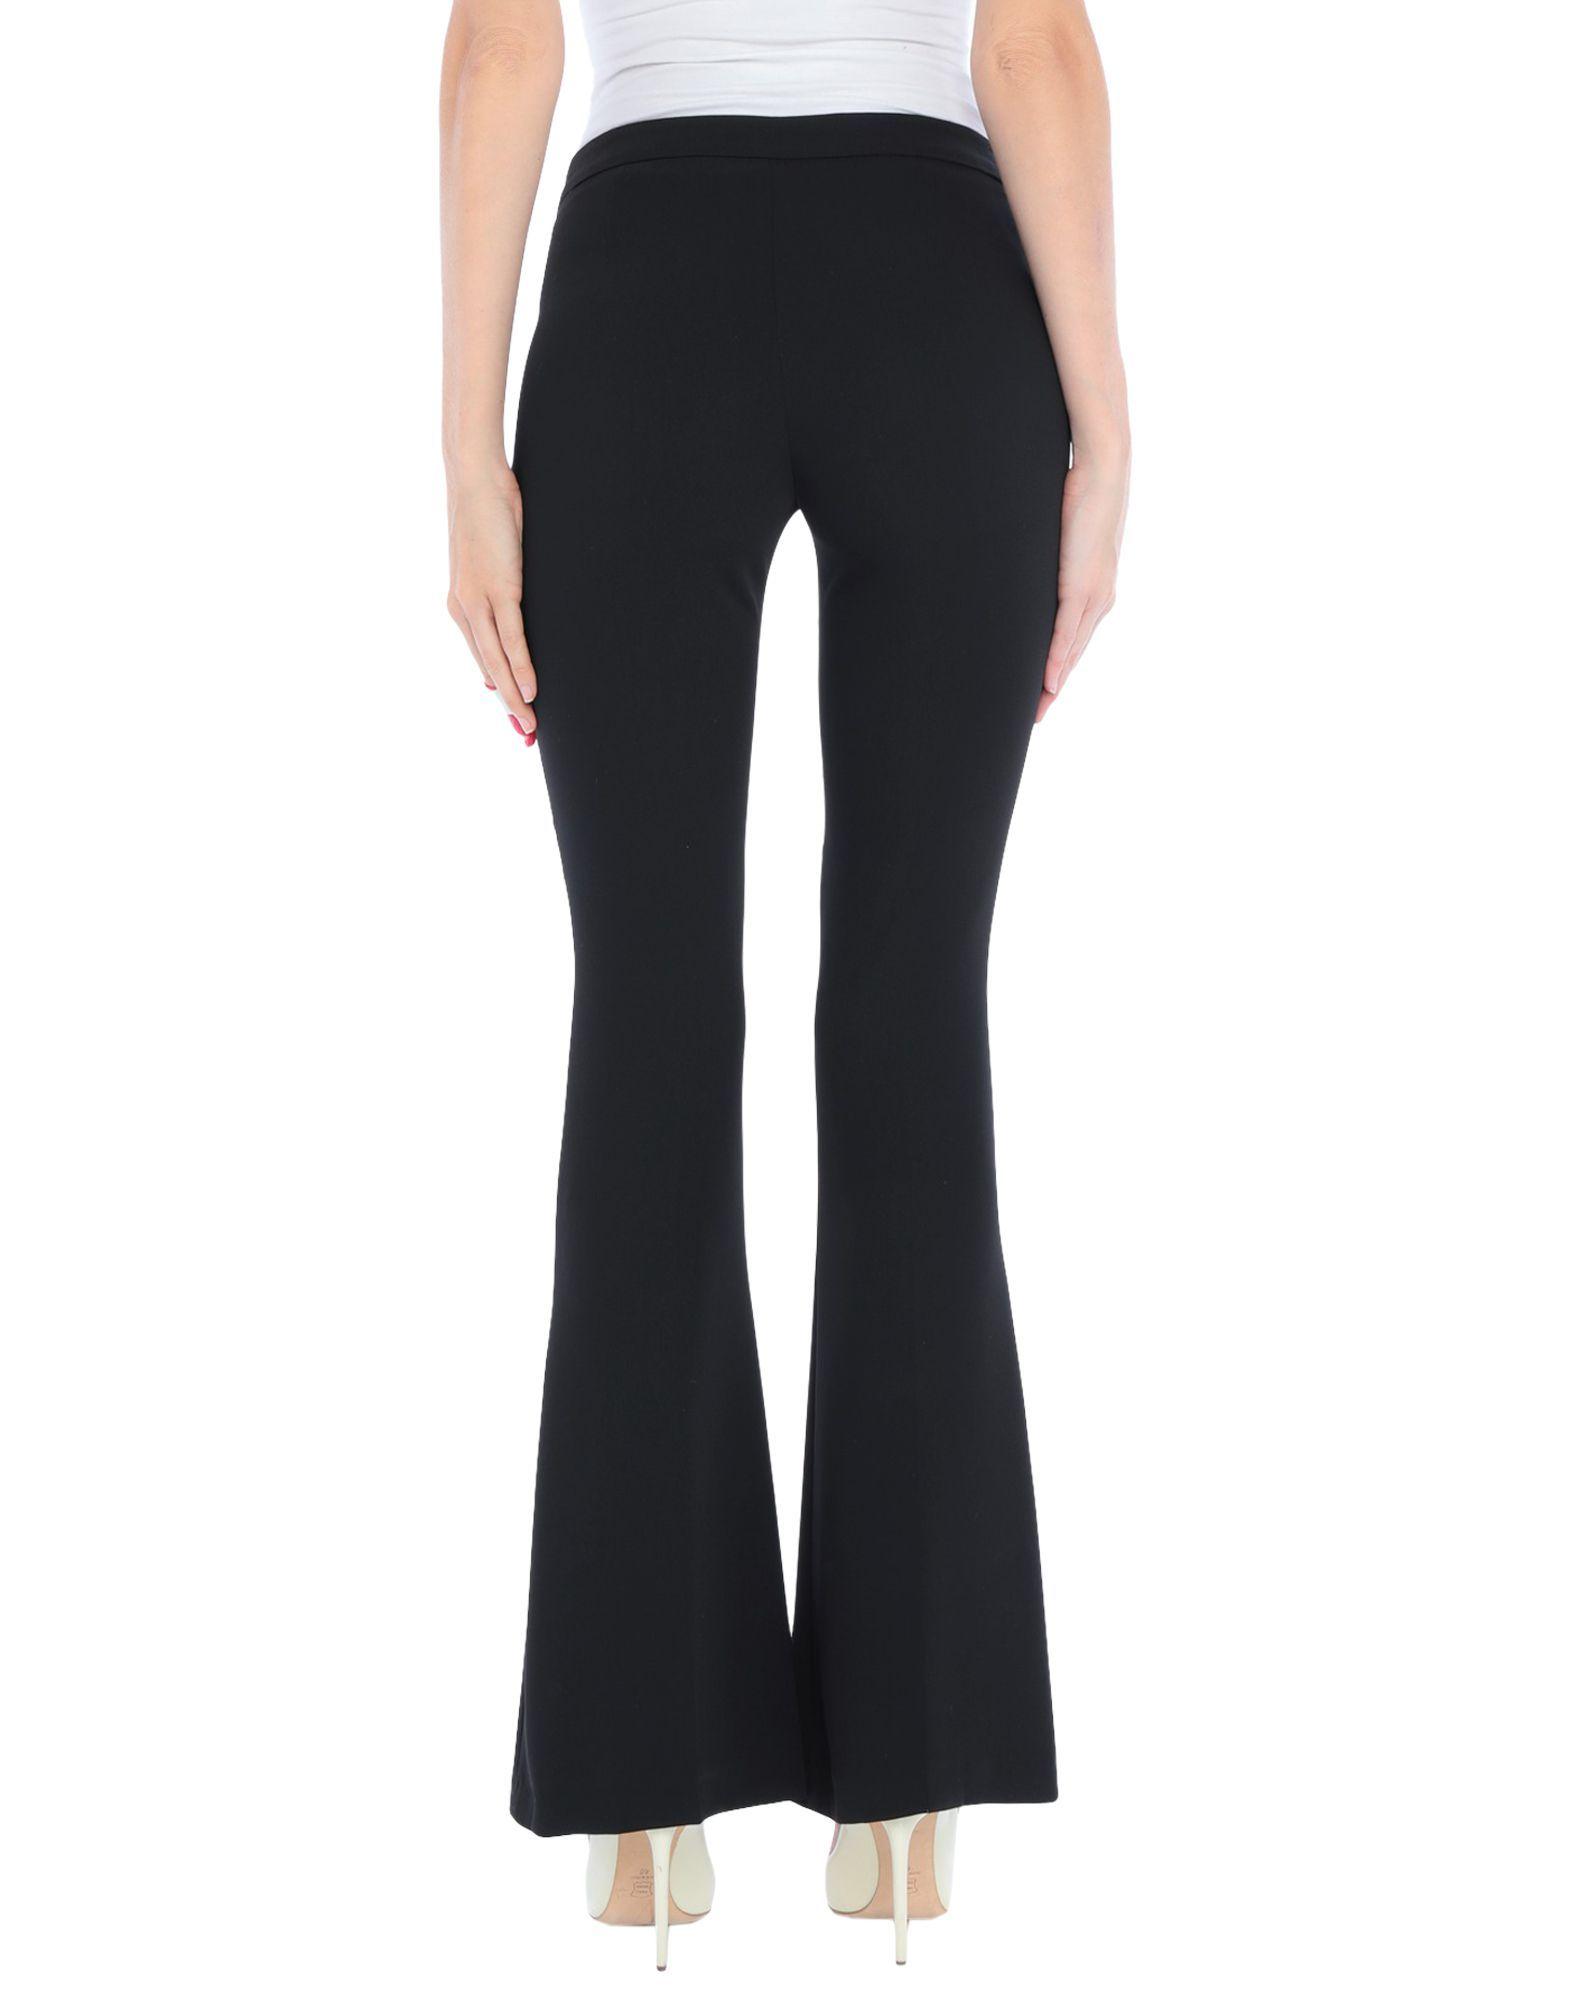 Trousers Compagnia Italiana Black Women's Polyester